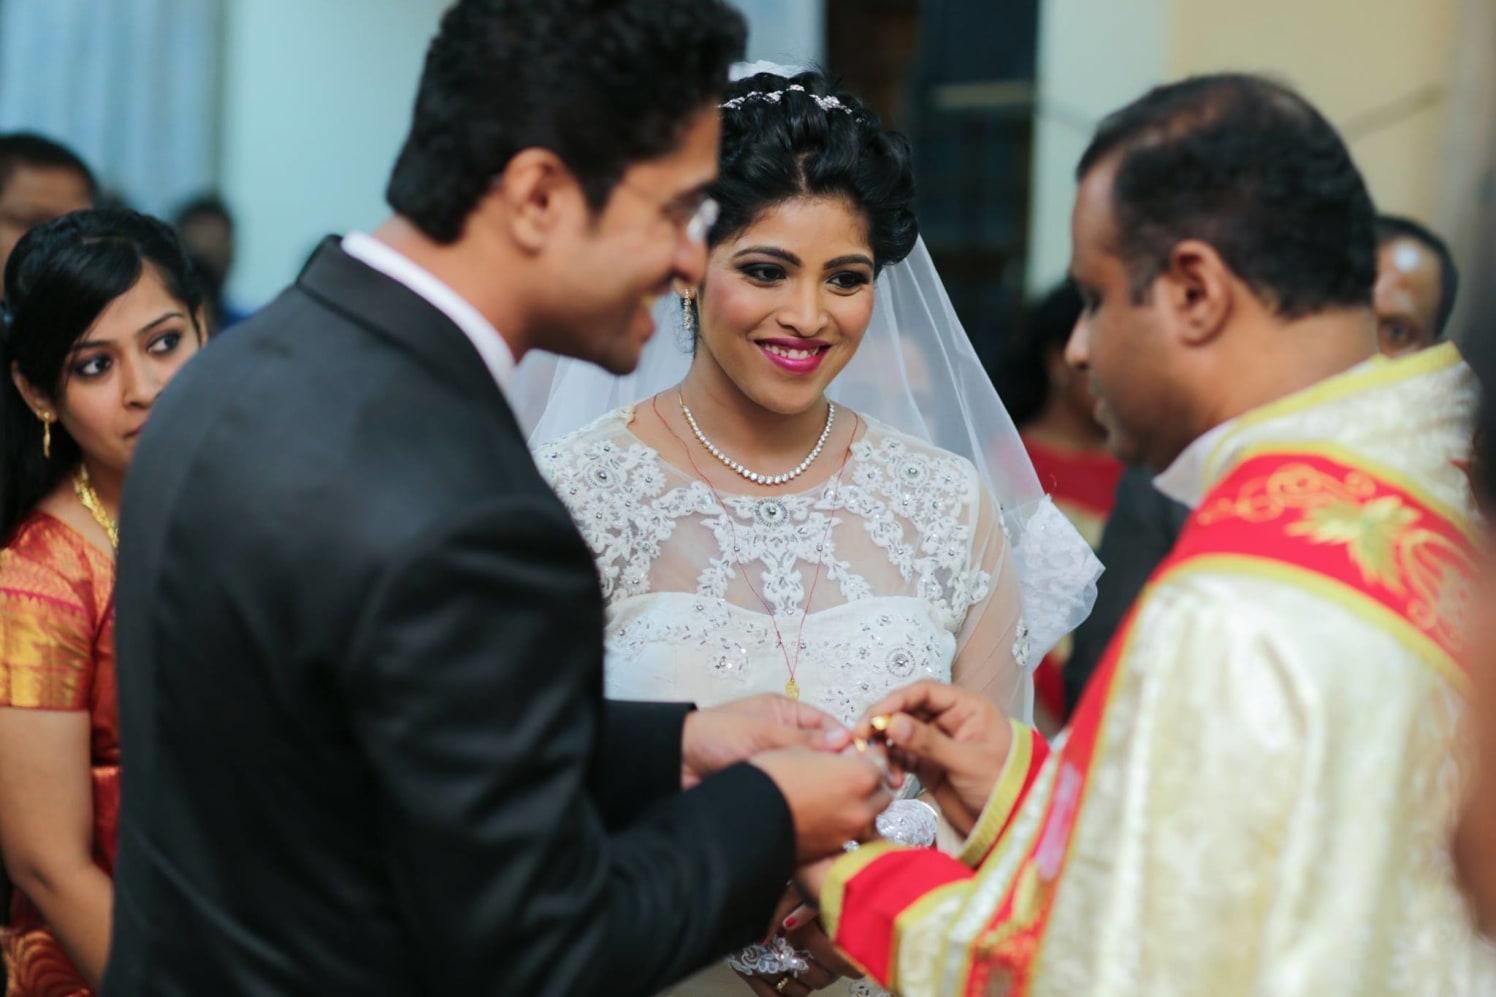 Christian Wedding Ring Ceremony Shot by Lloyd Bangera Wedding-photography | Weddings Photos & Ideas